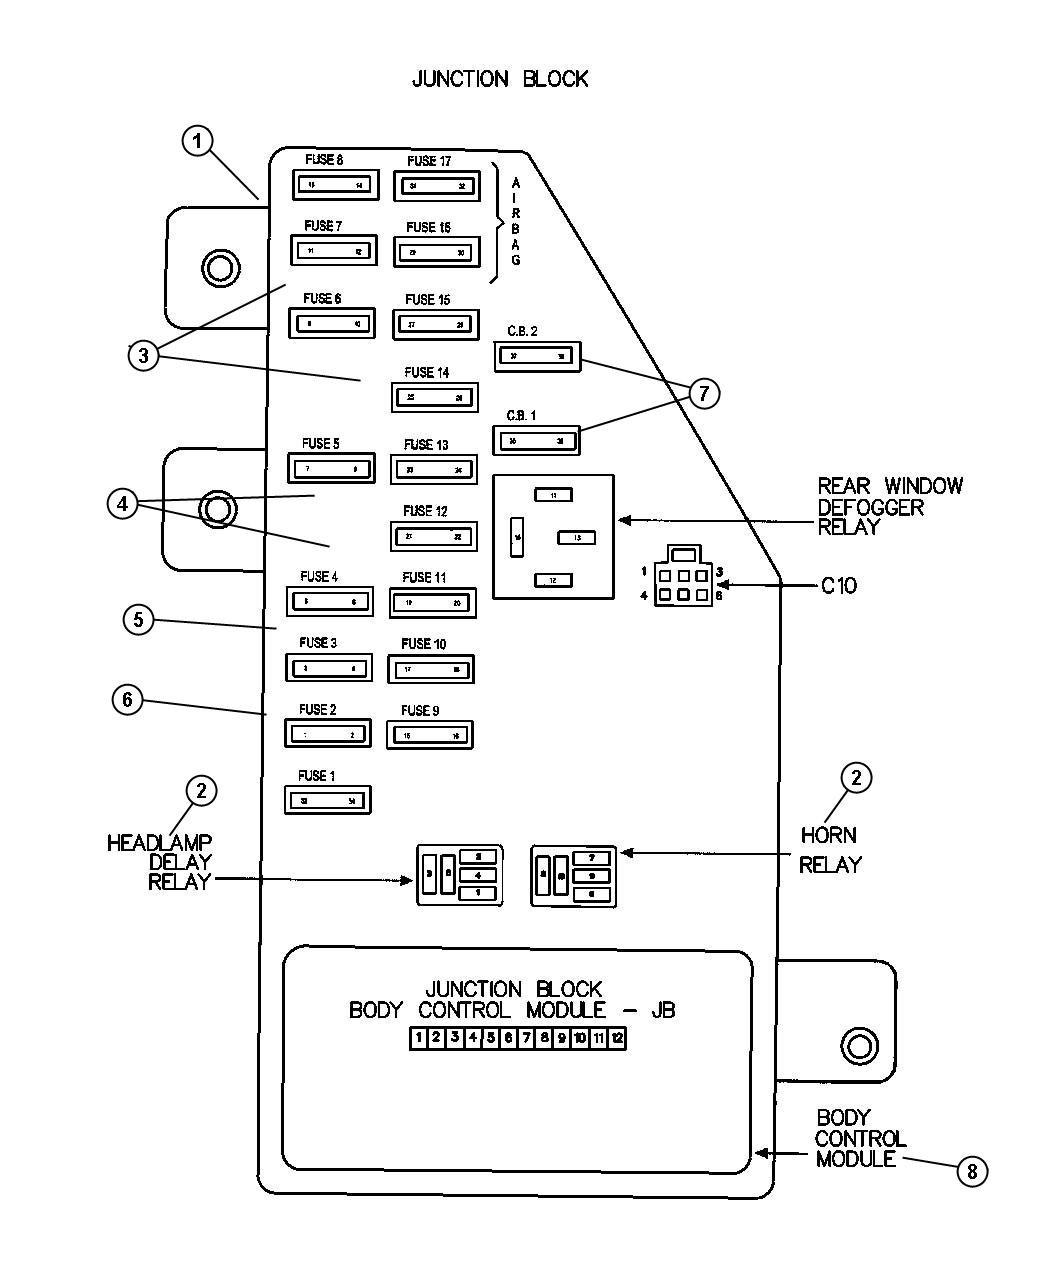 1997 Dodge Ram 1500 Transmission Wiring